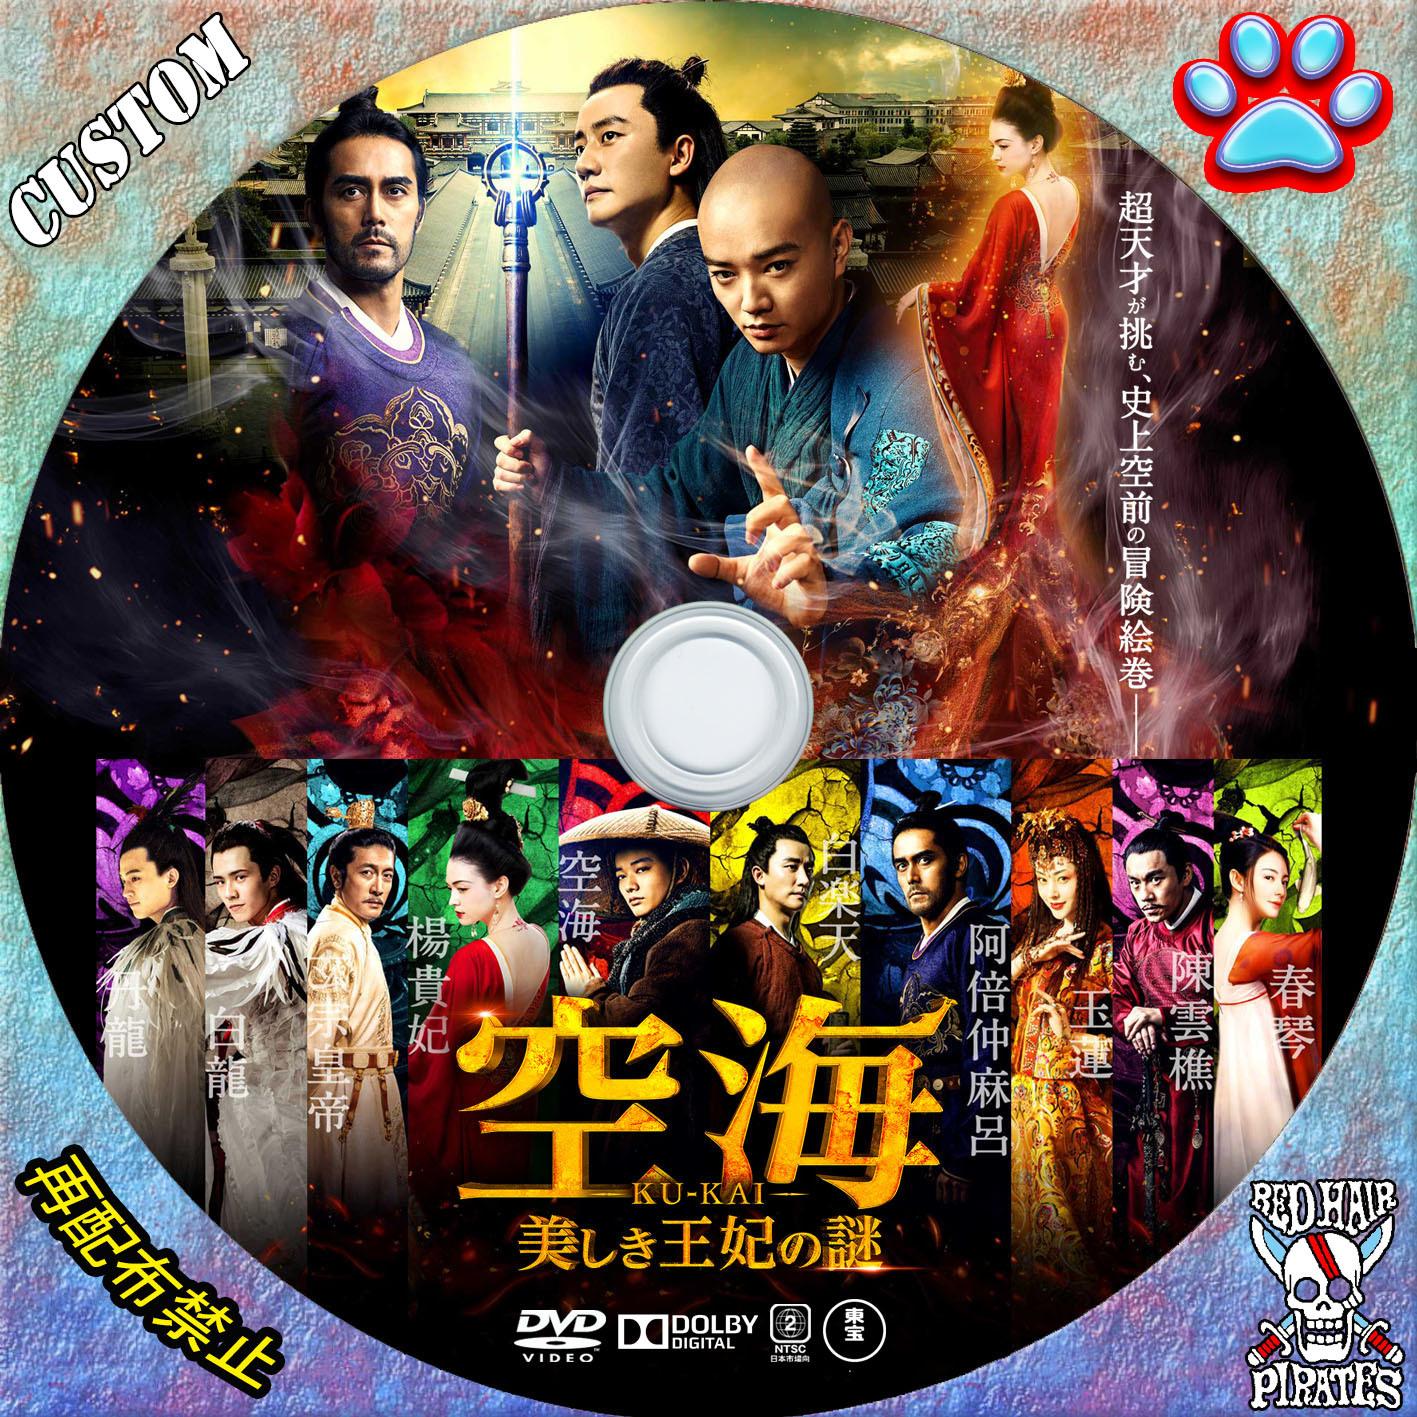 DVDラベル 空海 空海2